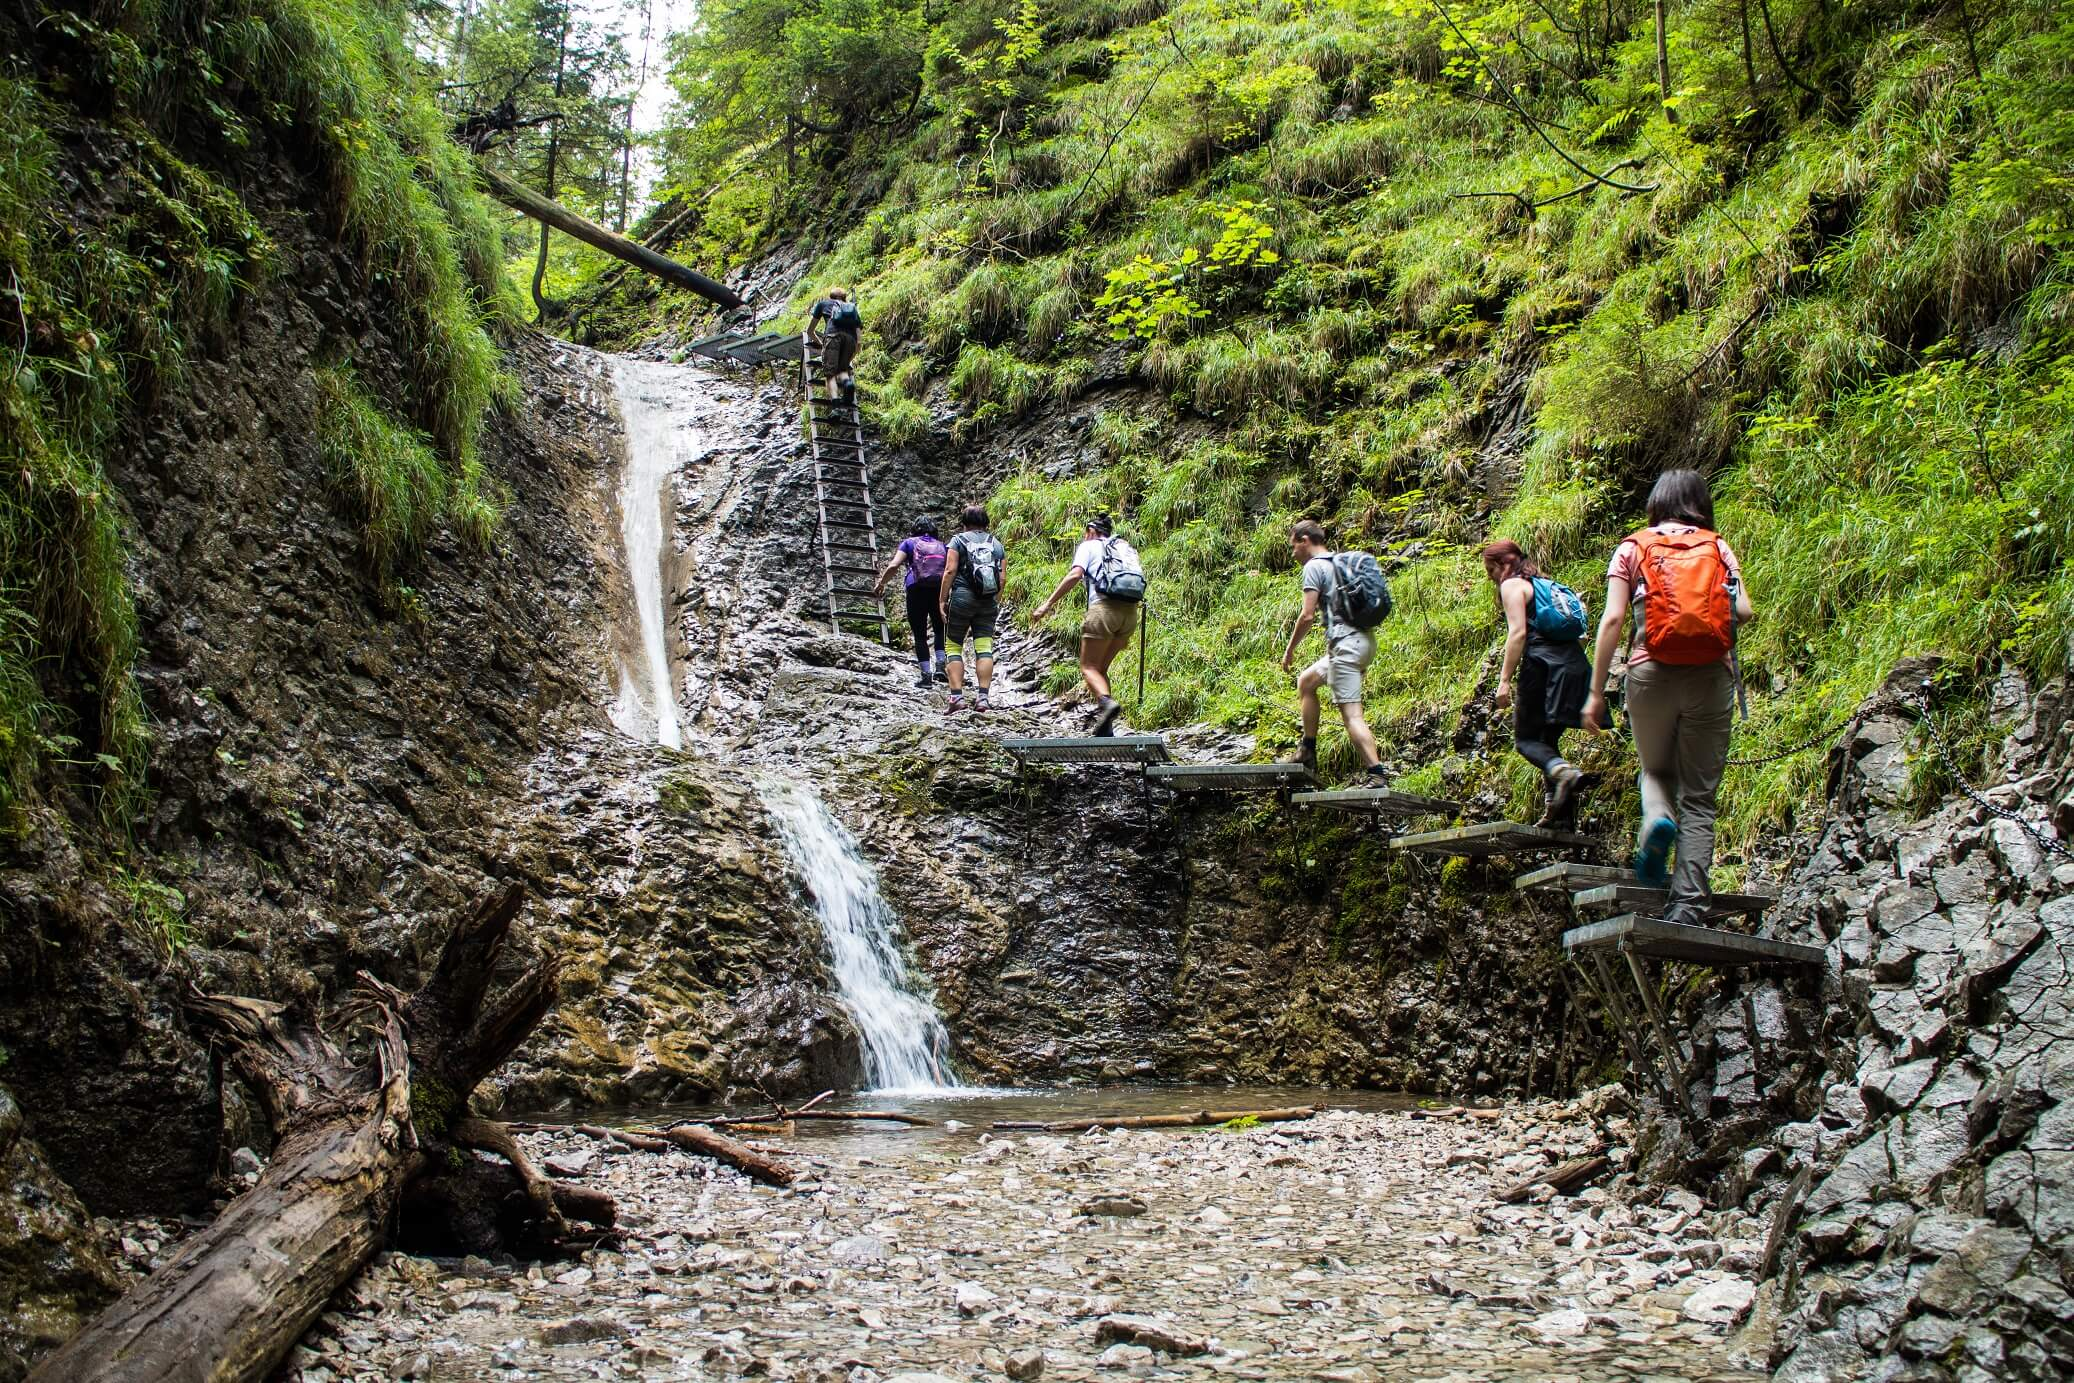 adventure-hiking-slovakia-august-bank-holiday-adventure